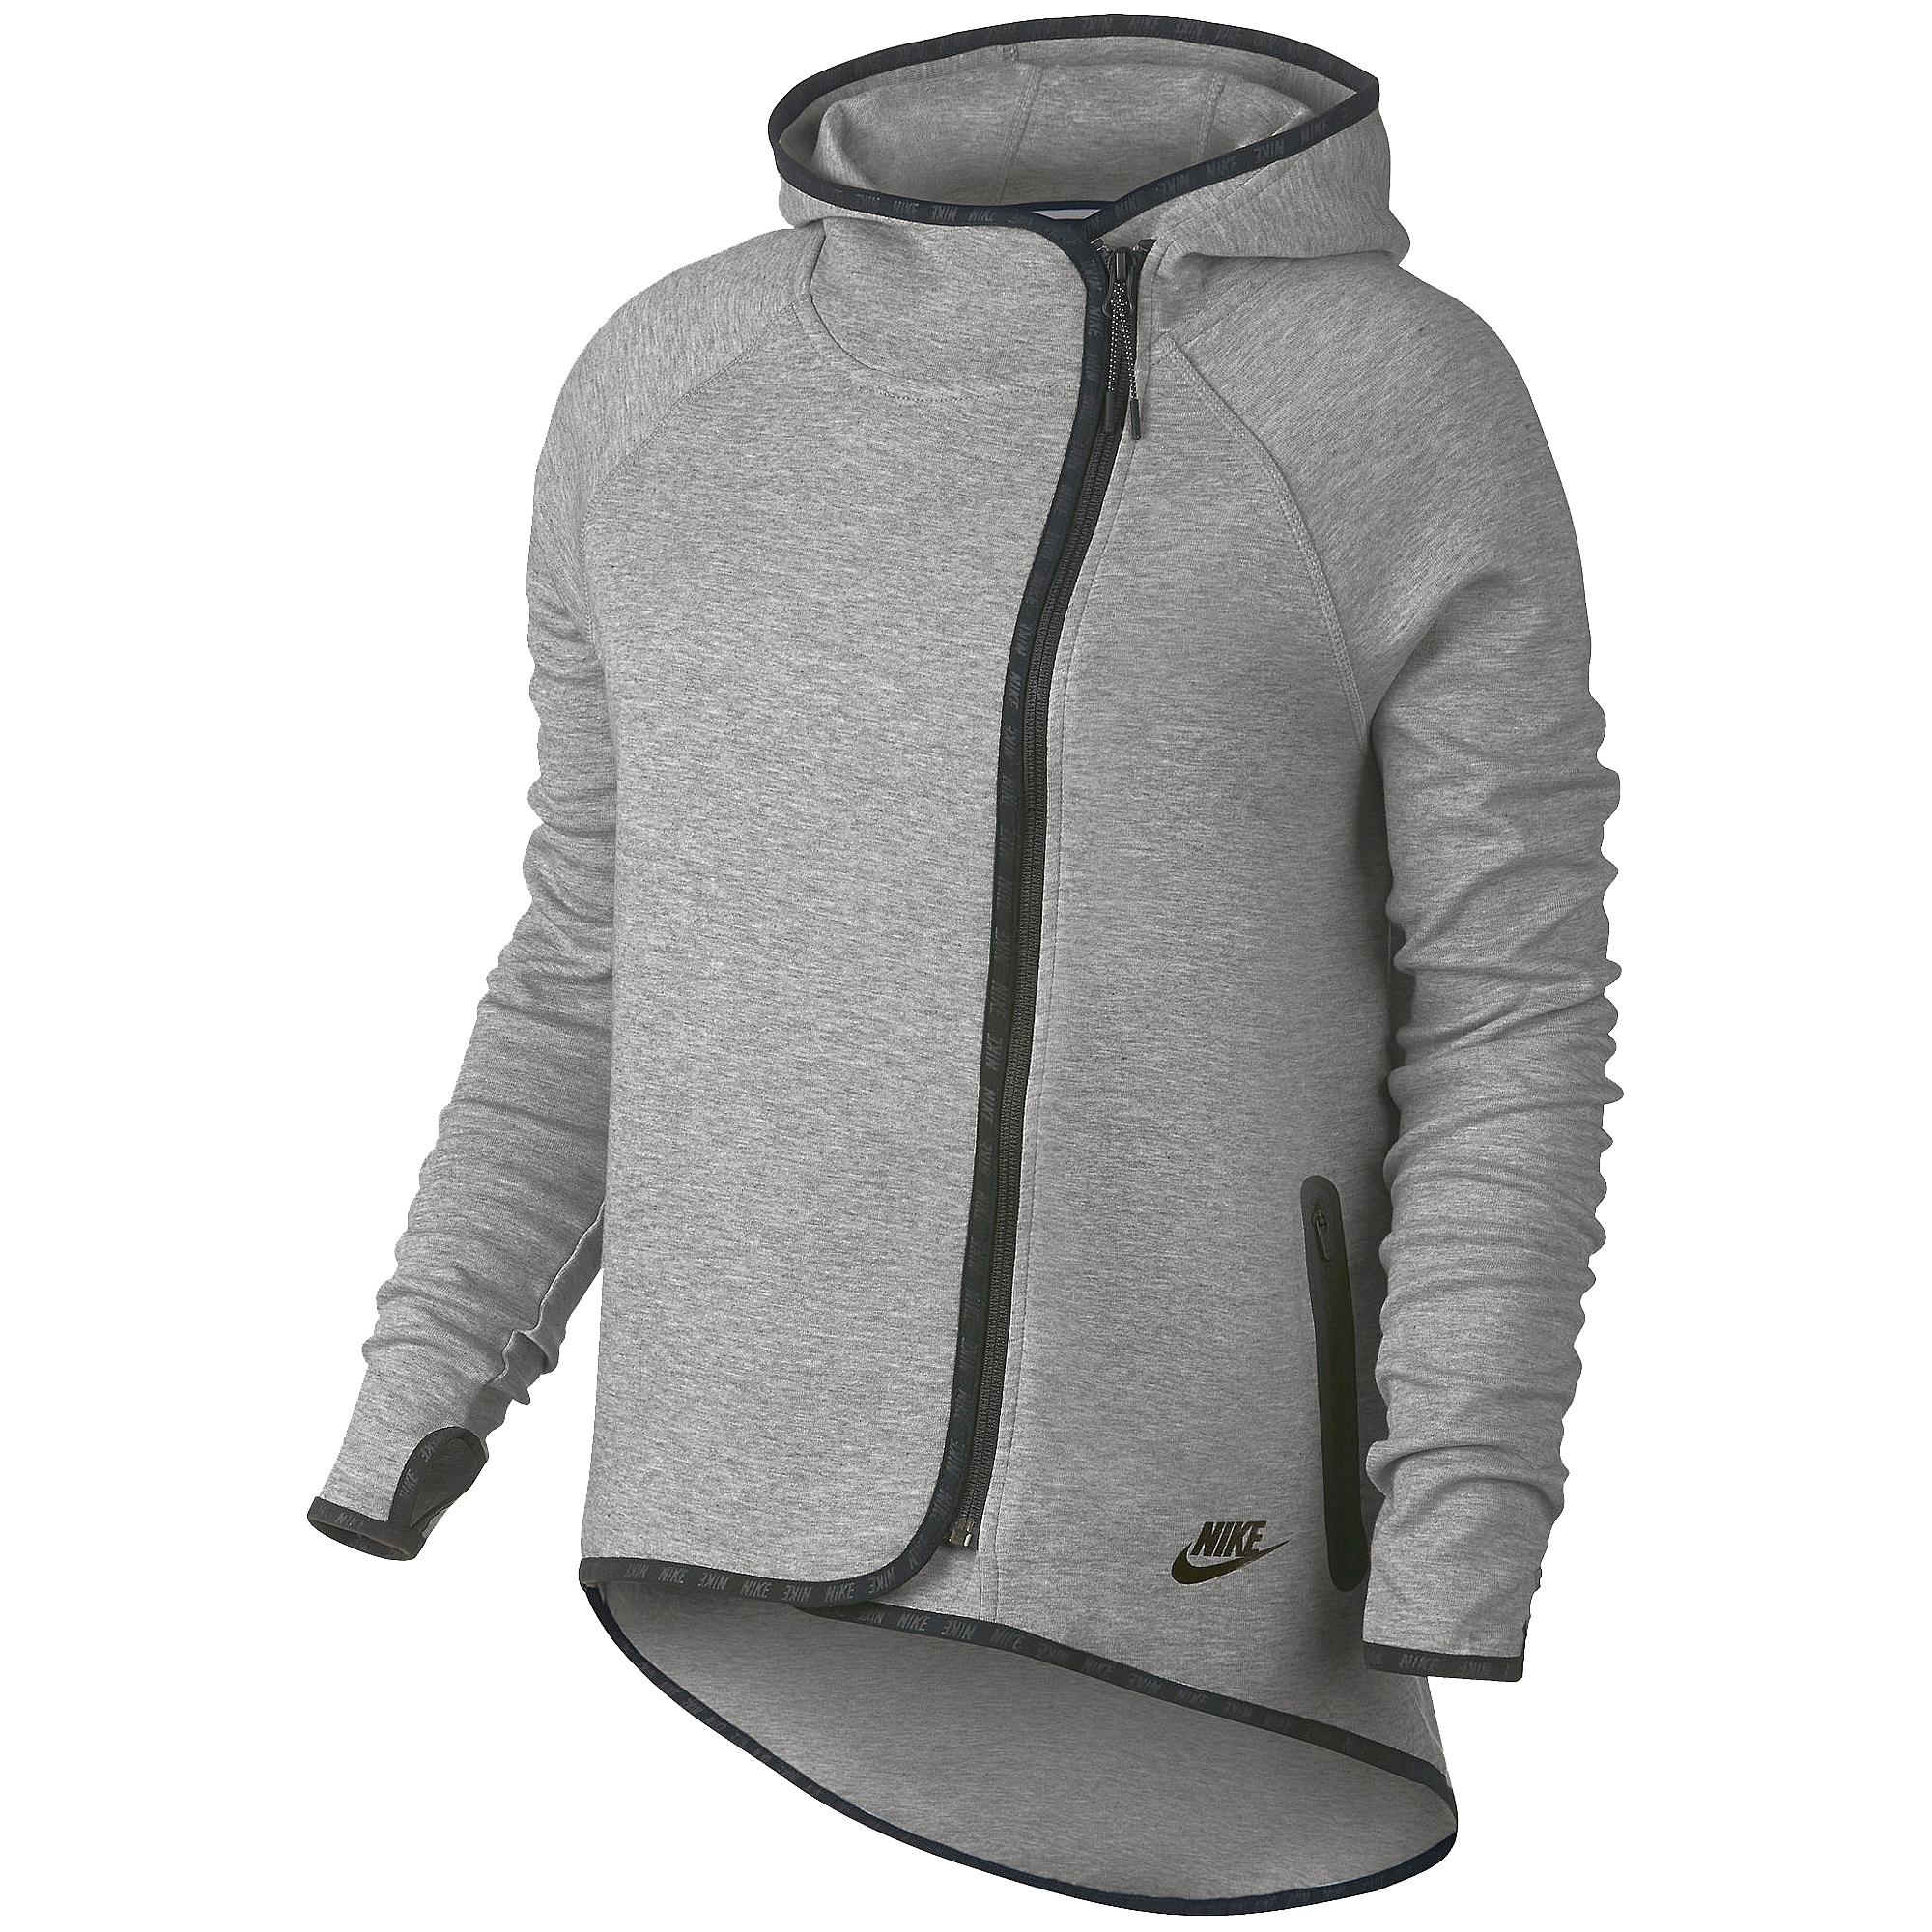 nike tech fleece cape ceket 669613 063. Black Bedroom Furniture Sets. Home Design Ideas